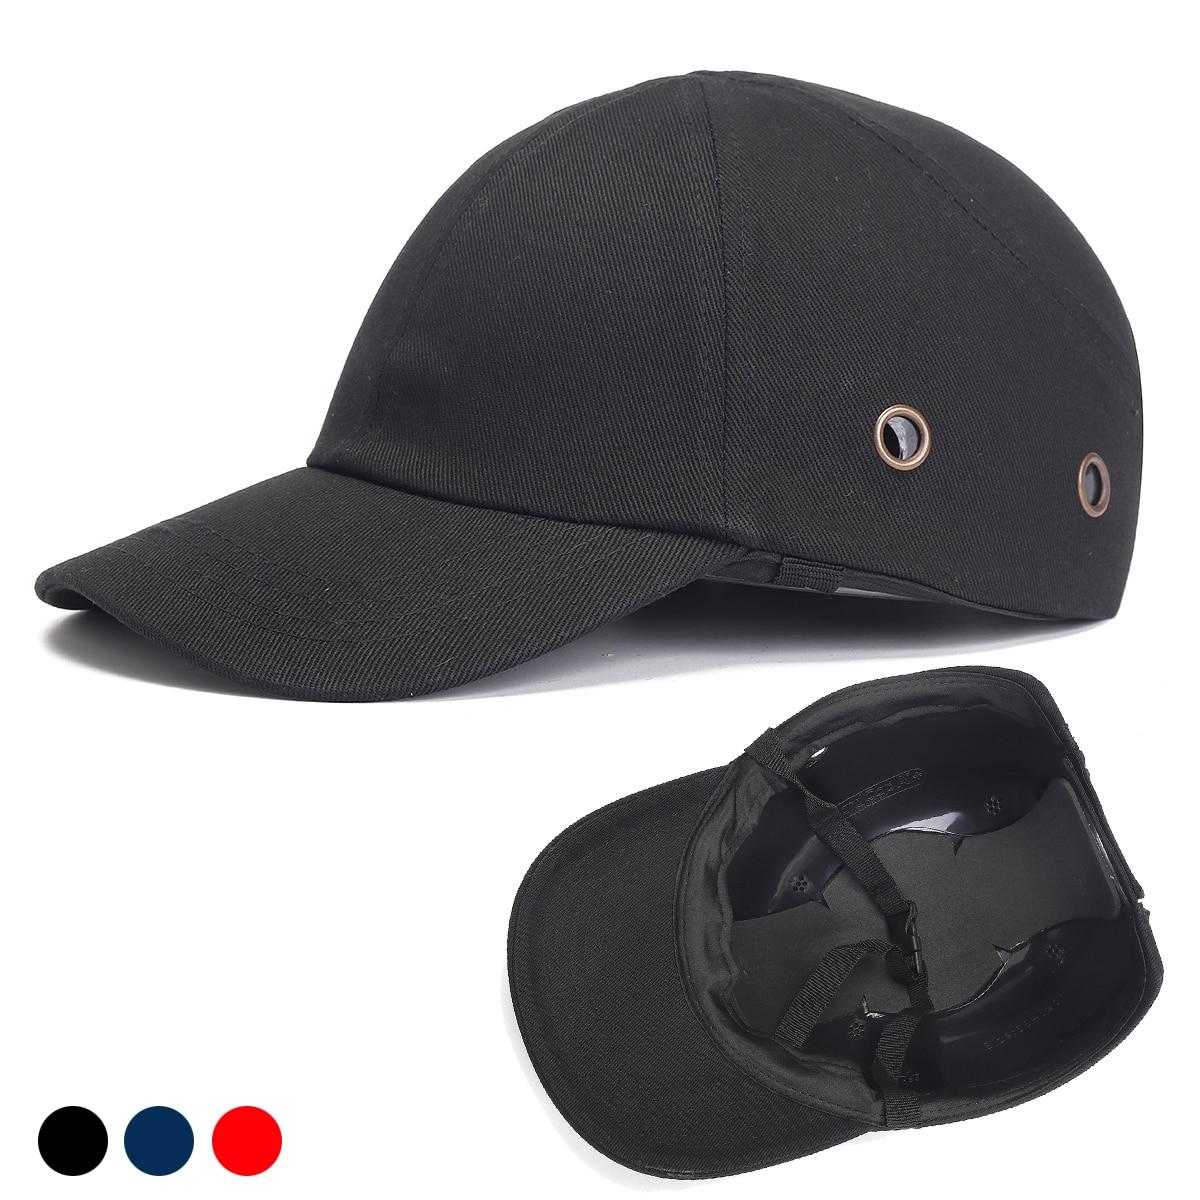 Unisex Work Safety Hat Bump Cap New Lightweight Breathable